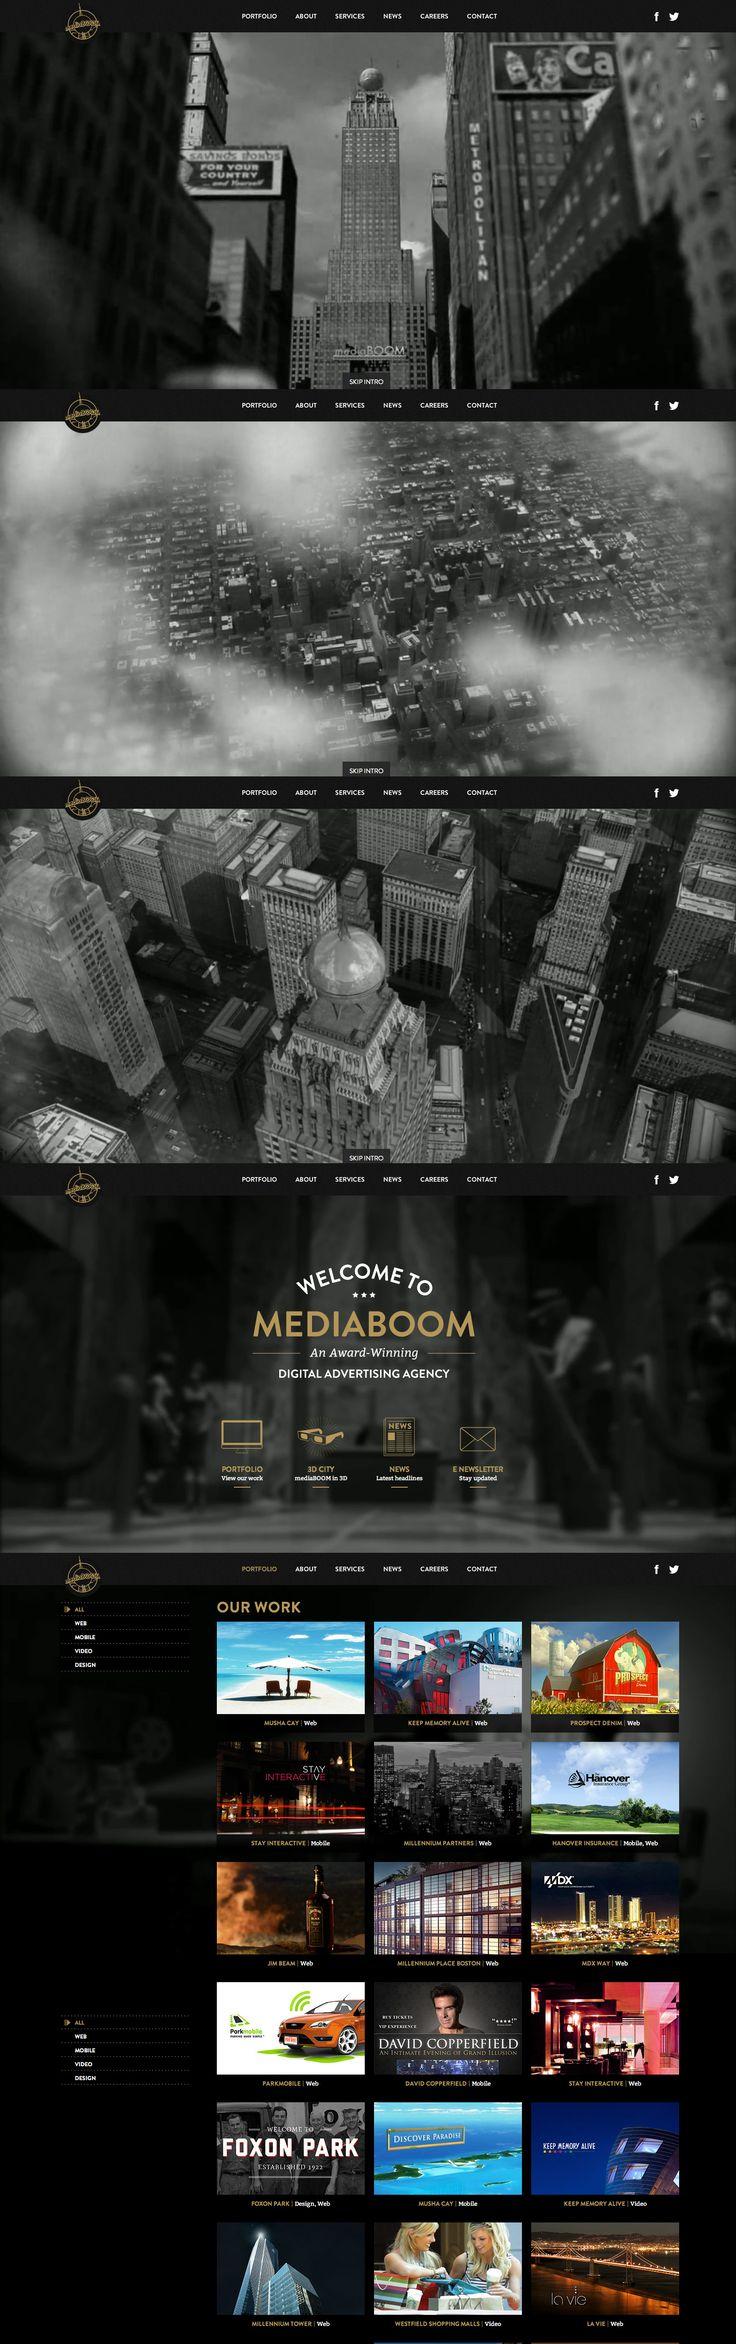 Layout photoshop web design website template tutorials tutorial 022 - Cidade Urbano Landscape Black B Website Design Layoutweb